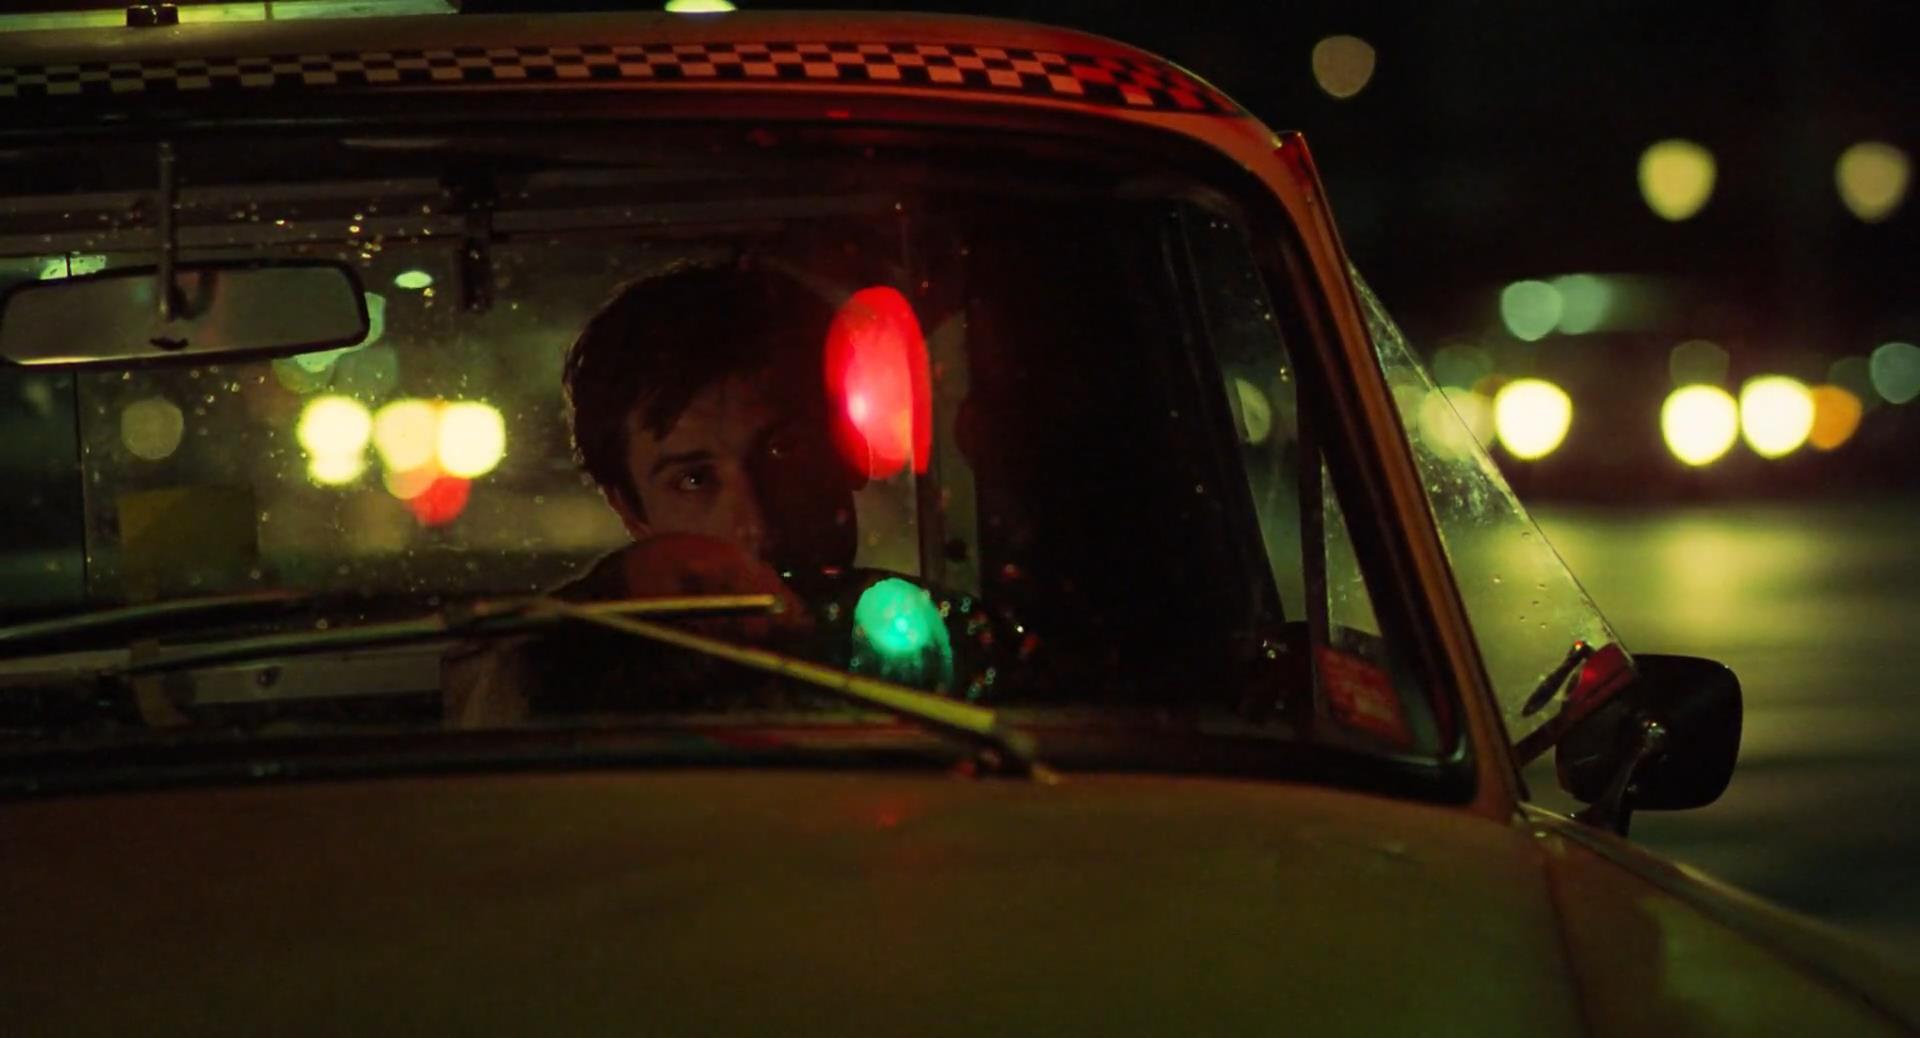 Full Hd Car Wallpapers 2014 Taxi Driver Stills From Beautiful Films